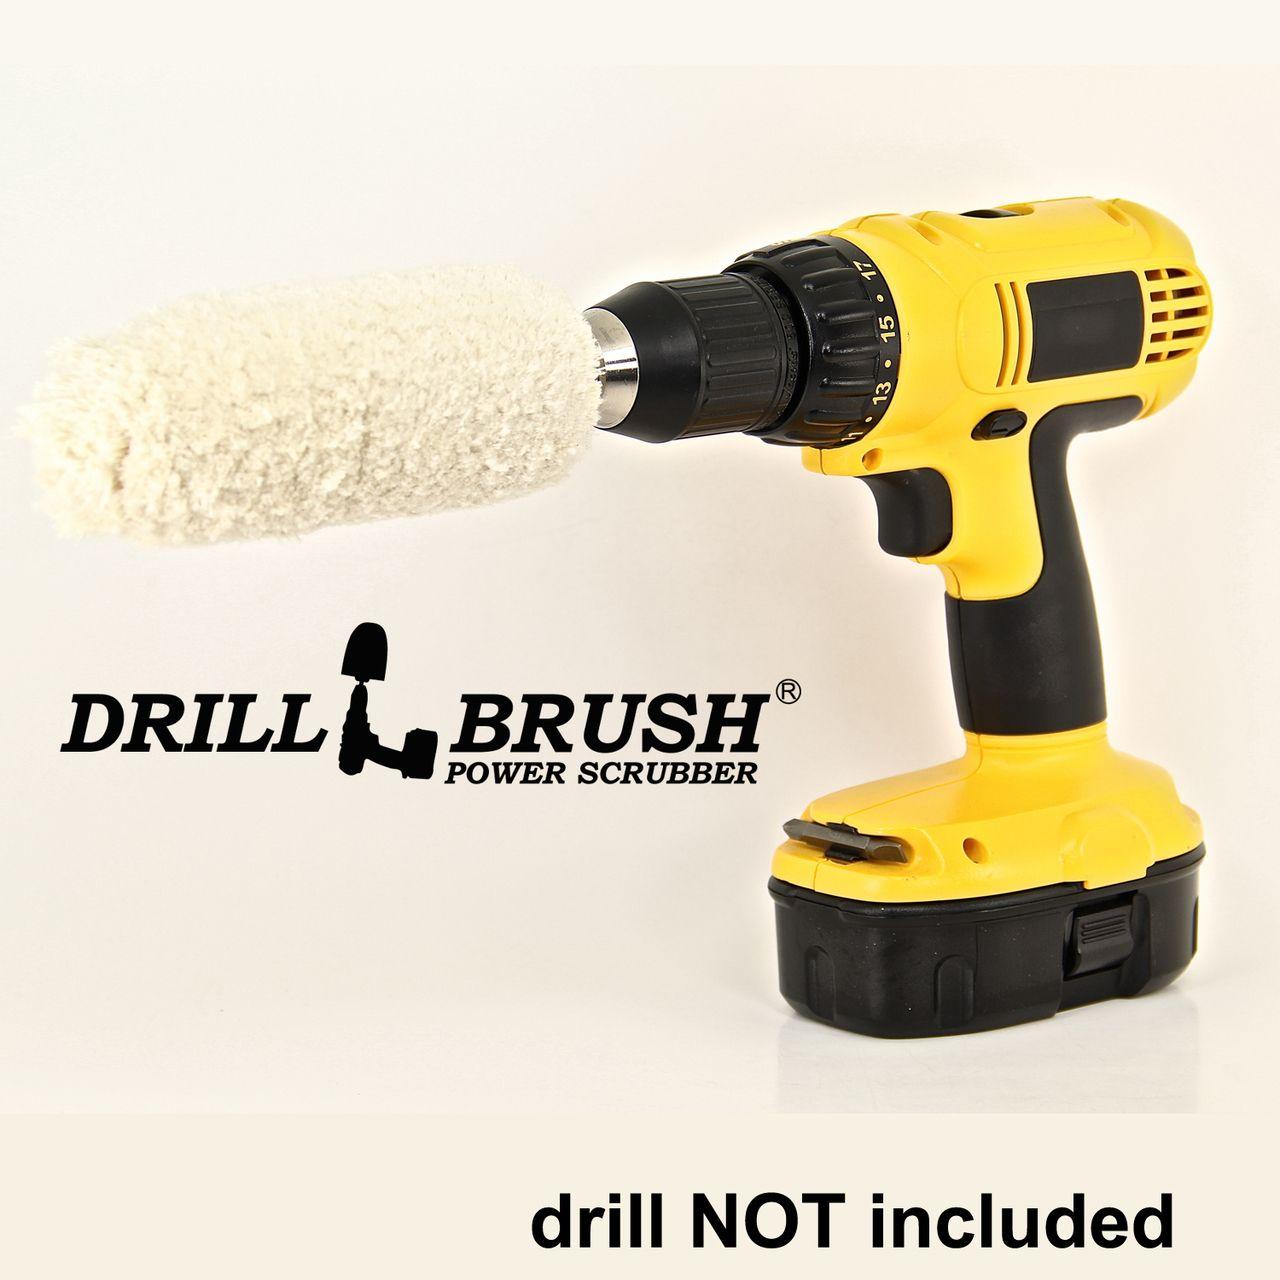 Soft Cotton Buffing Drill Brush - Super soft cotton